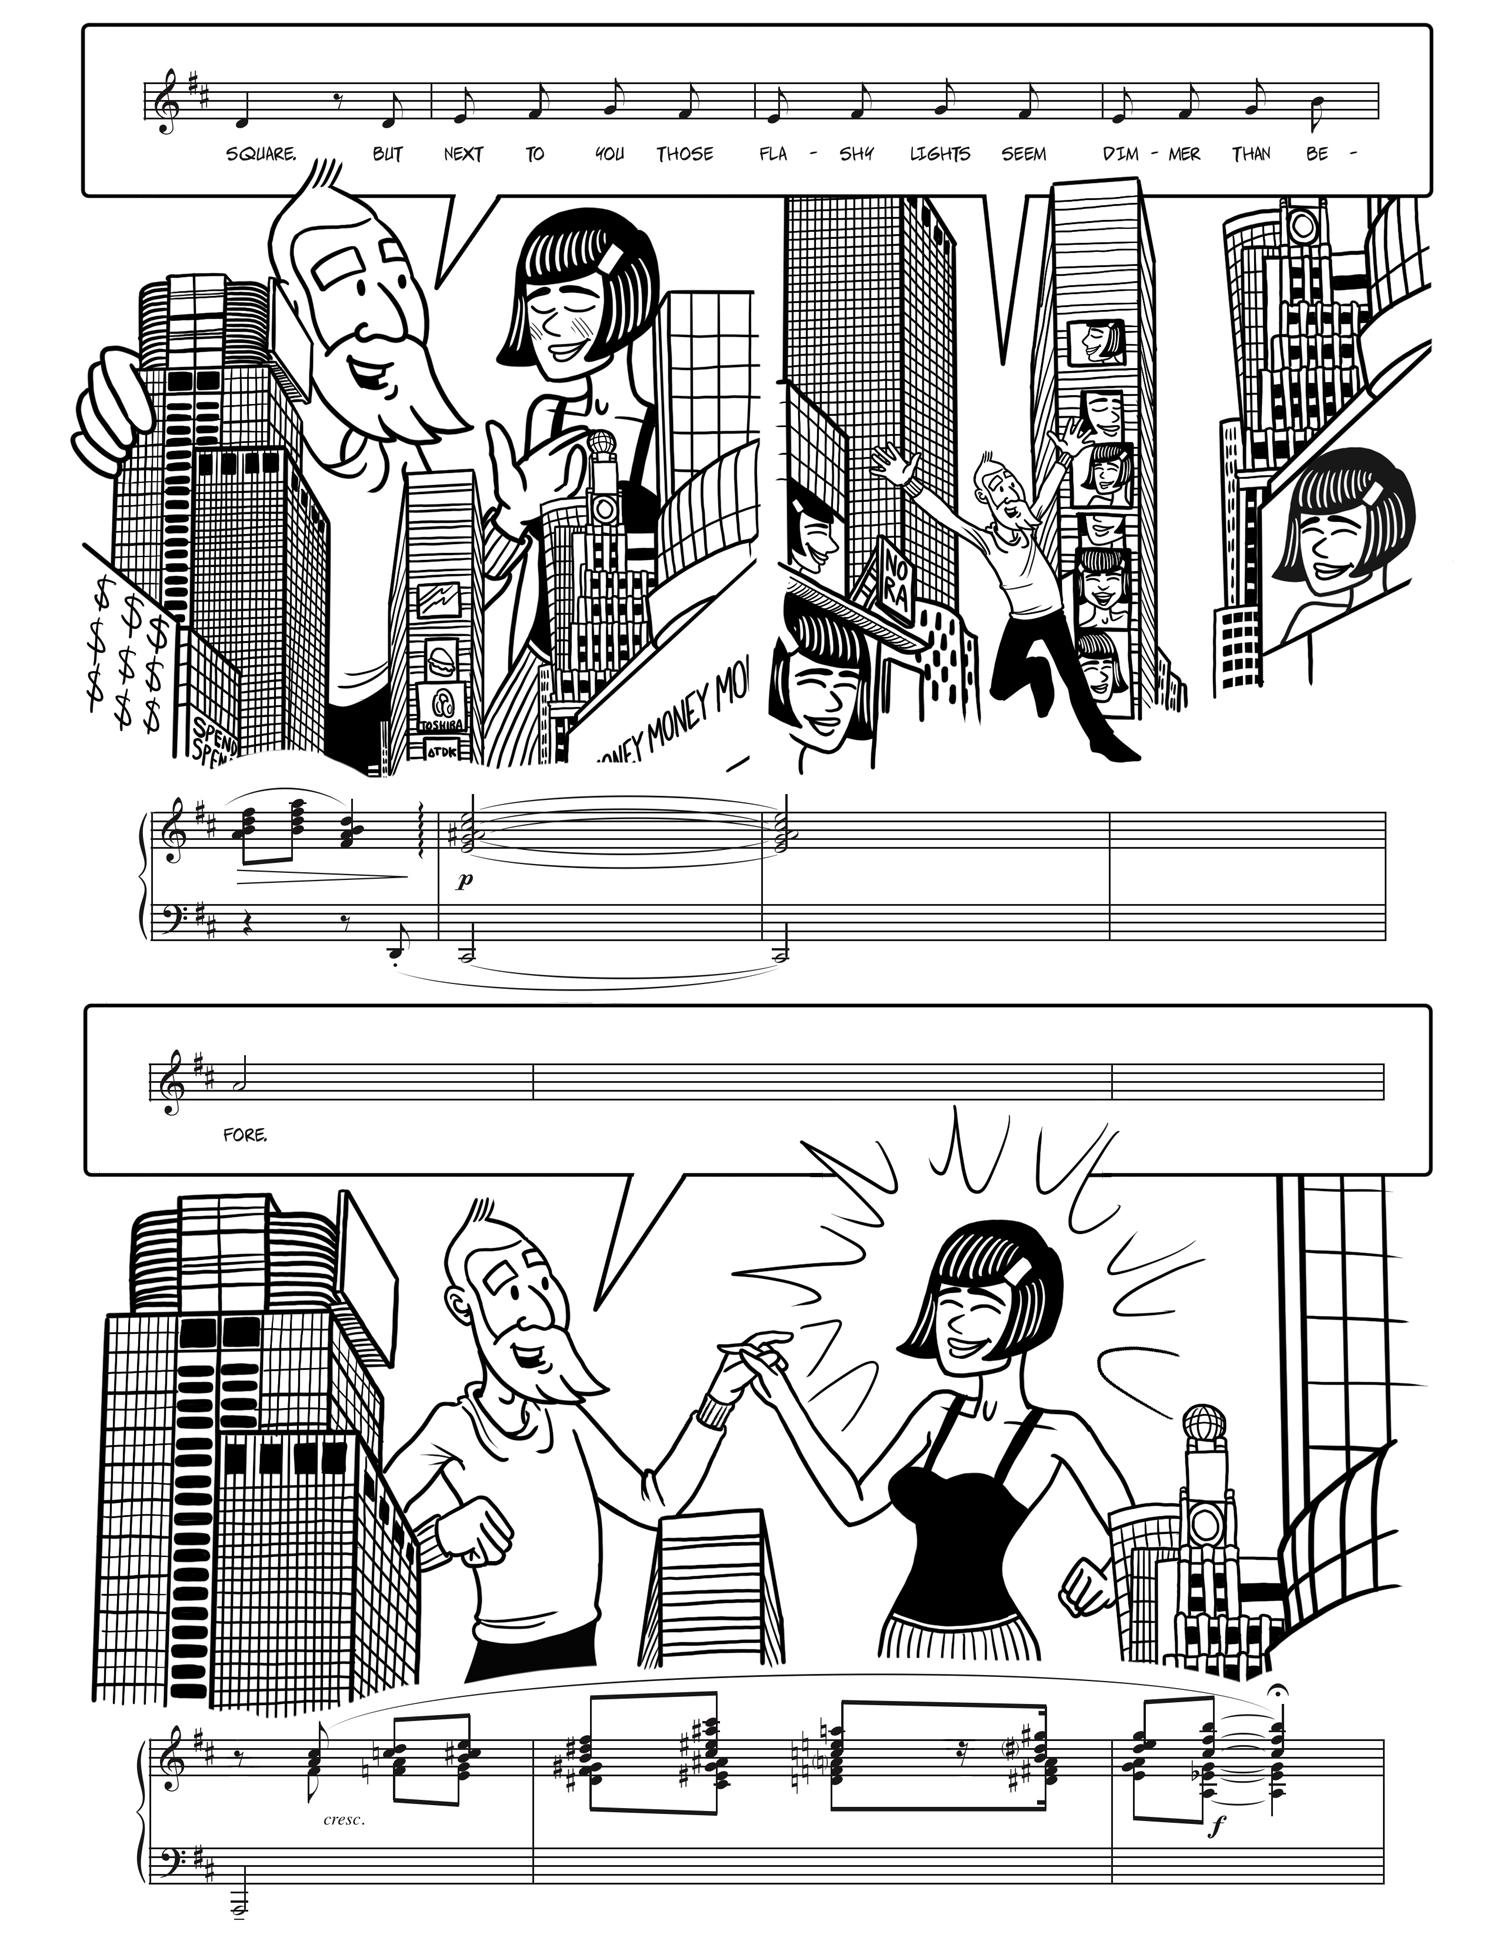 PAGE-351.jpg